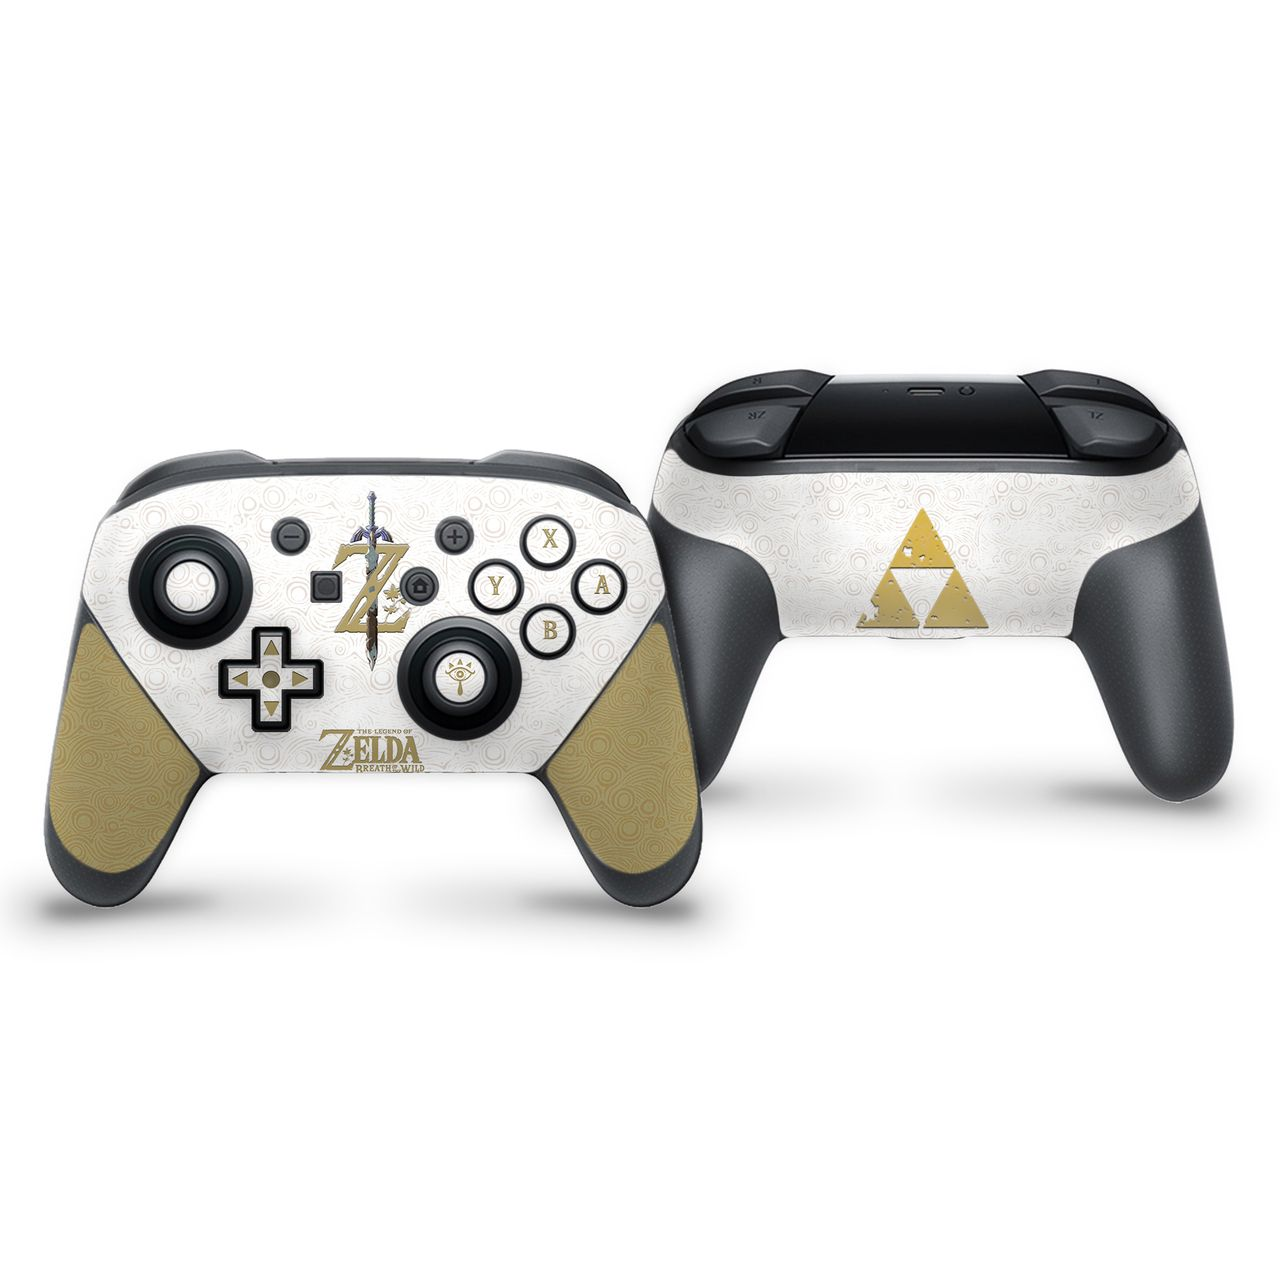 Botw White The Legend Of Zelda Theme Nintendo Switch Pro Controller Skin Nintendo Switch Accessories Nintendo Legend Of Zelda